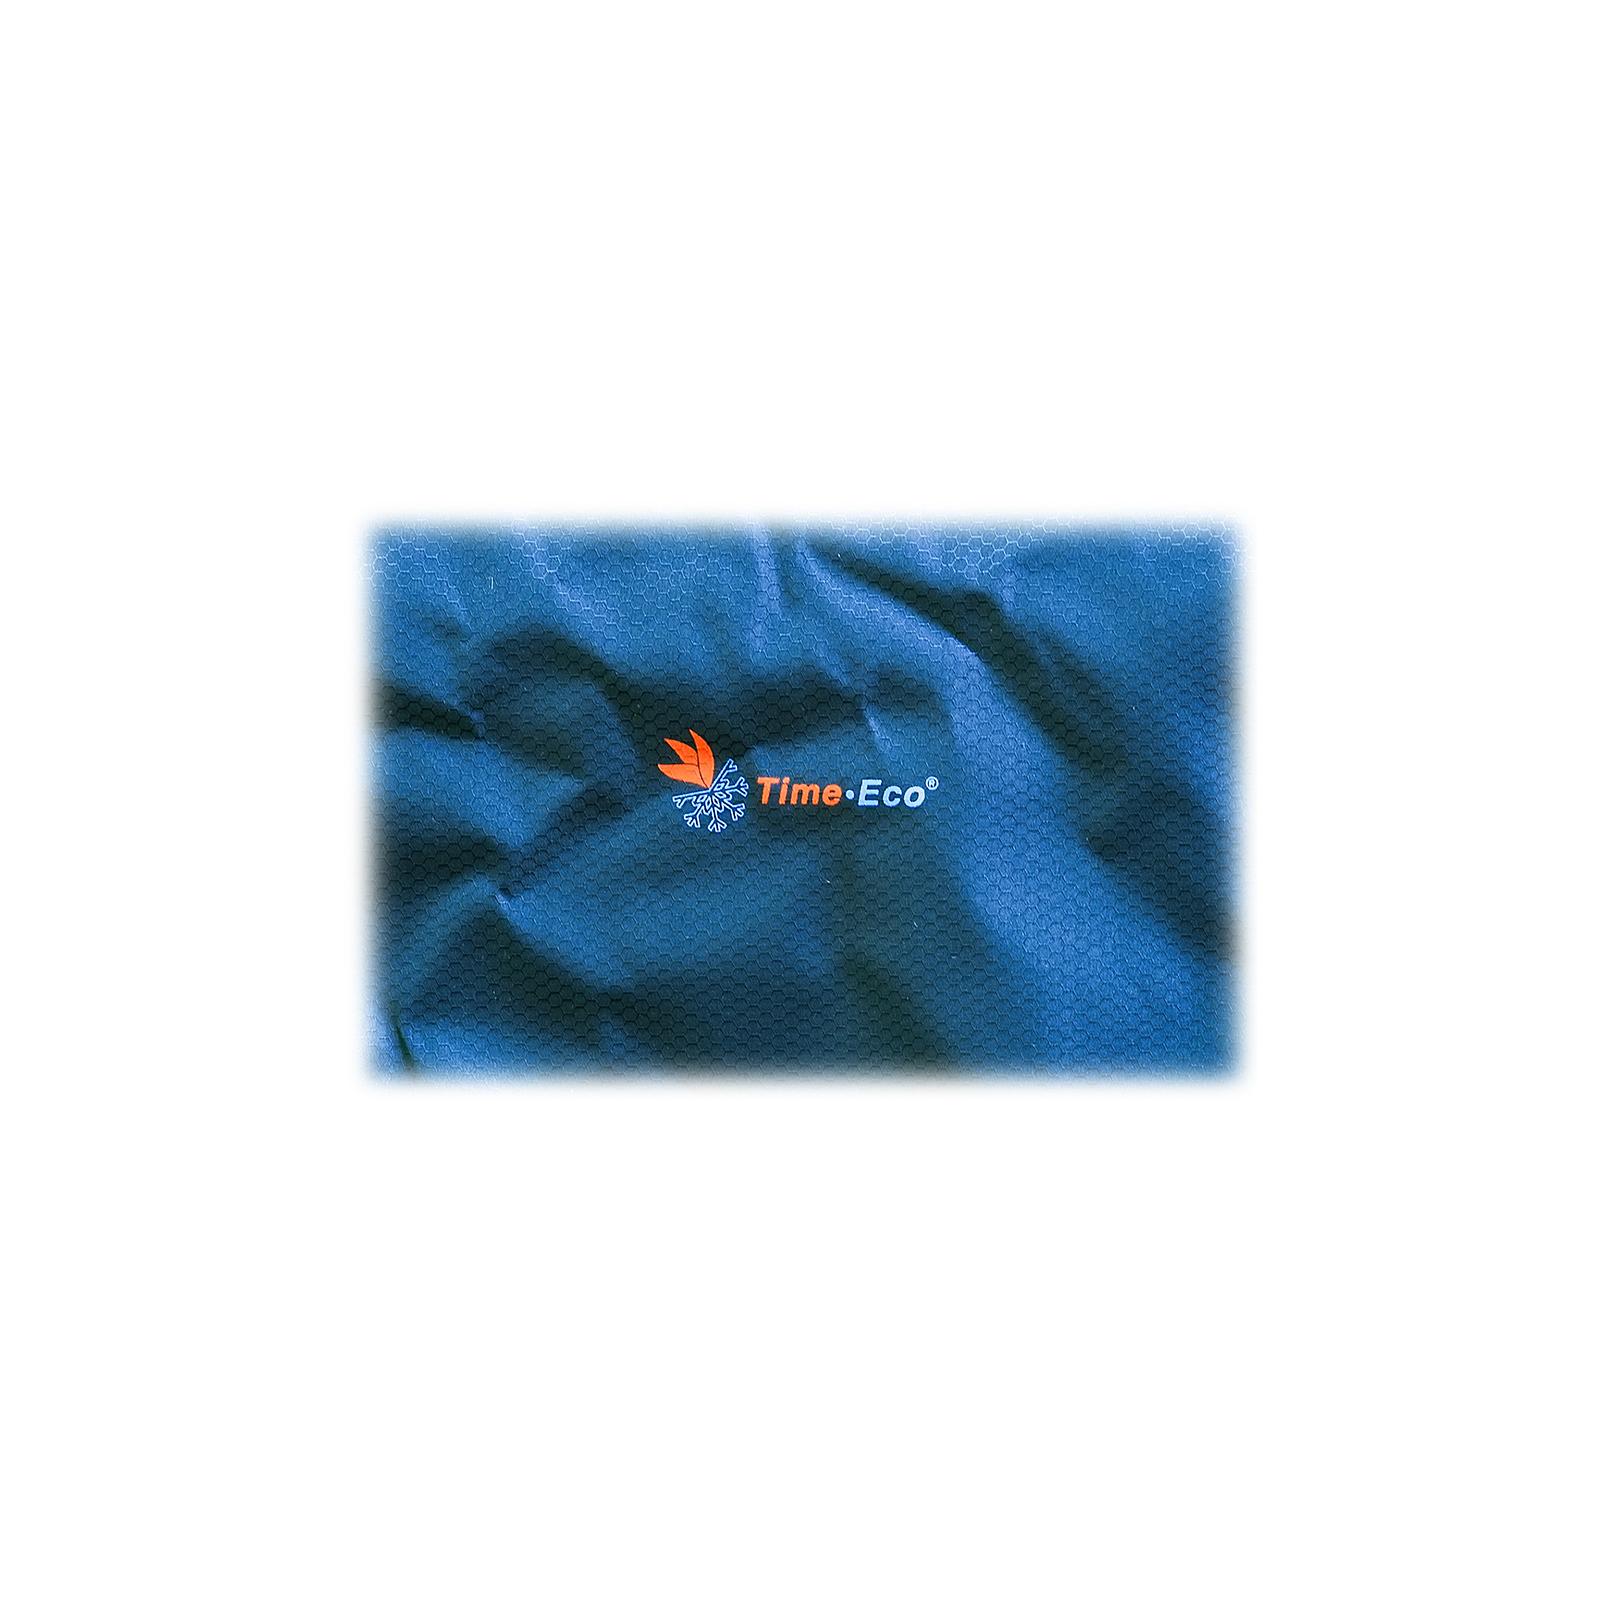 Кресло складное Time Eco TE-30 SD-140 (30 SD-140) изображение 3